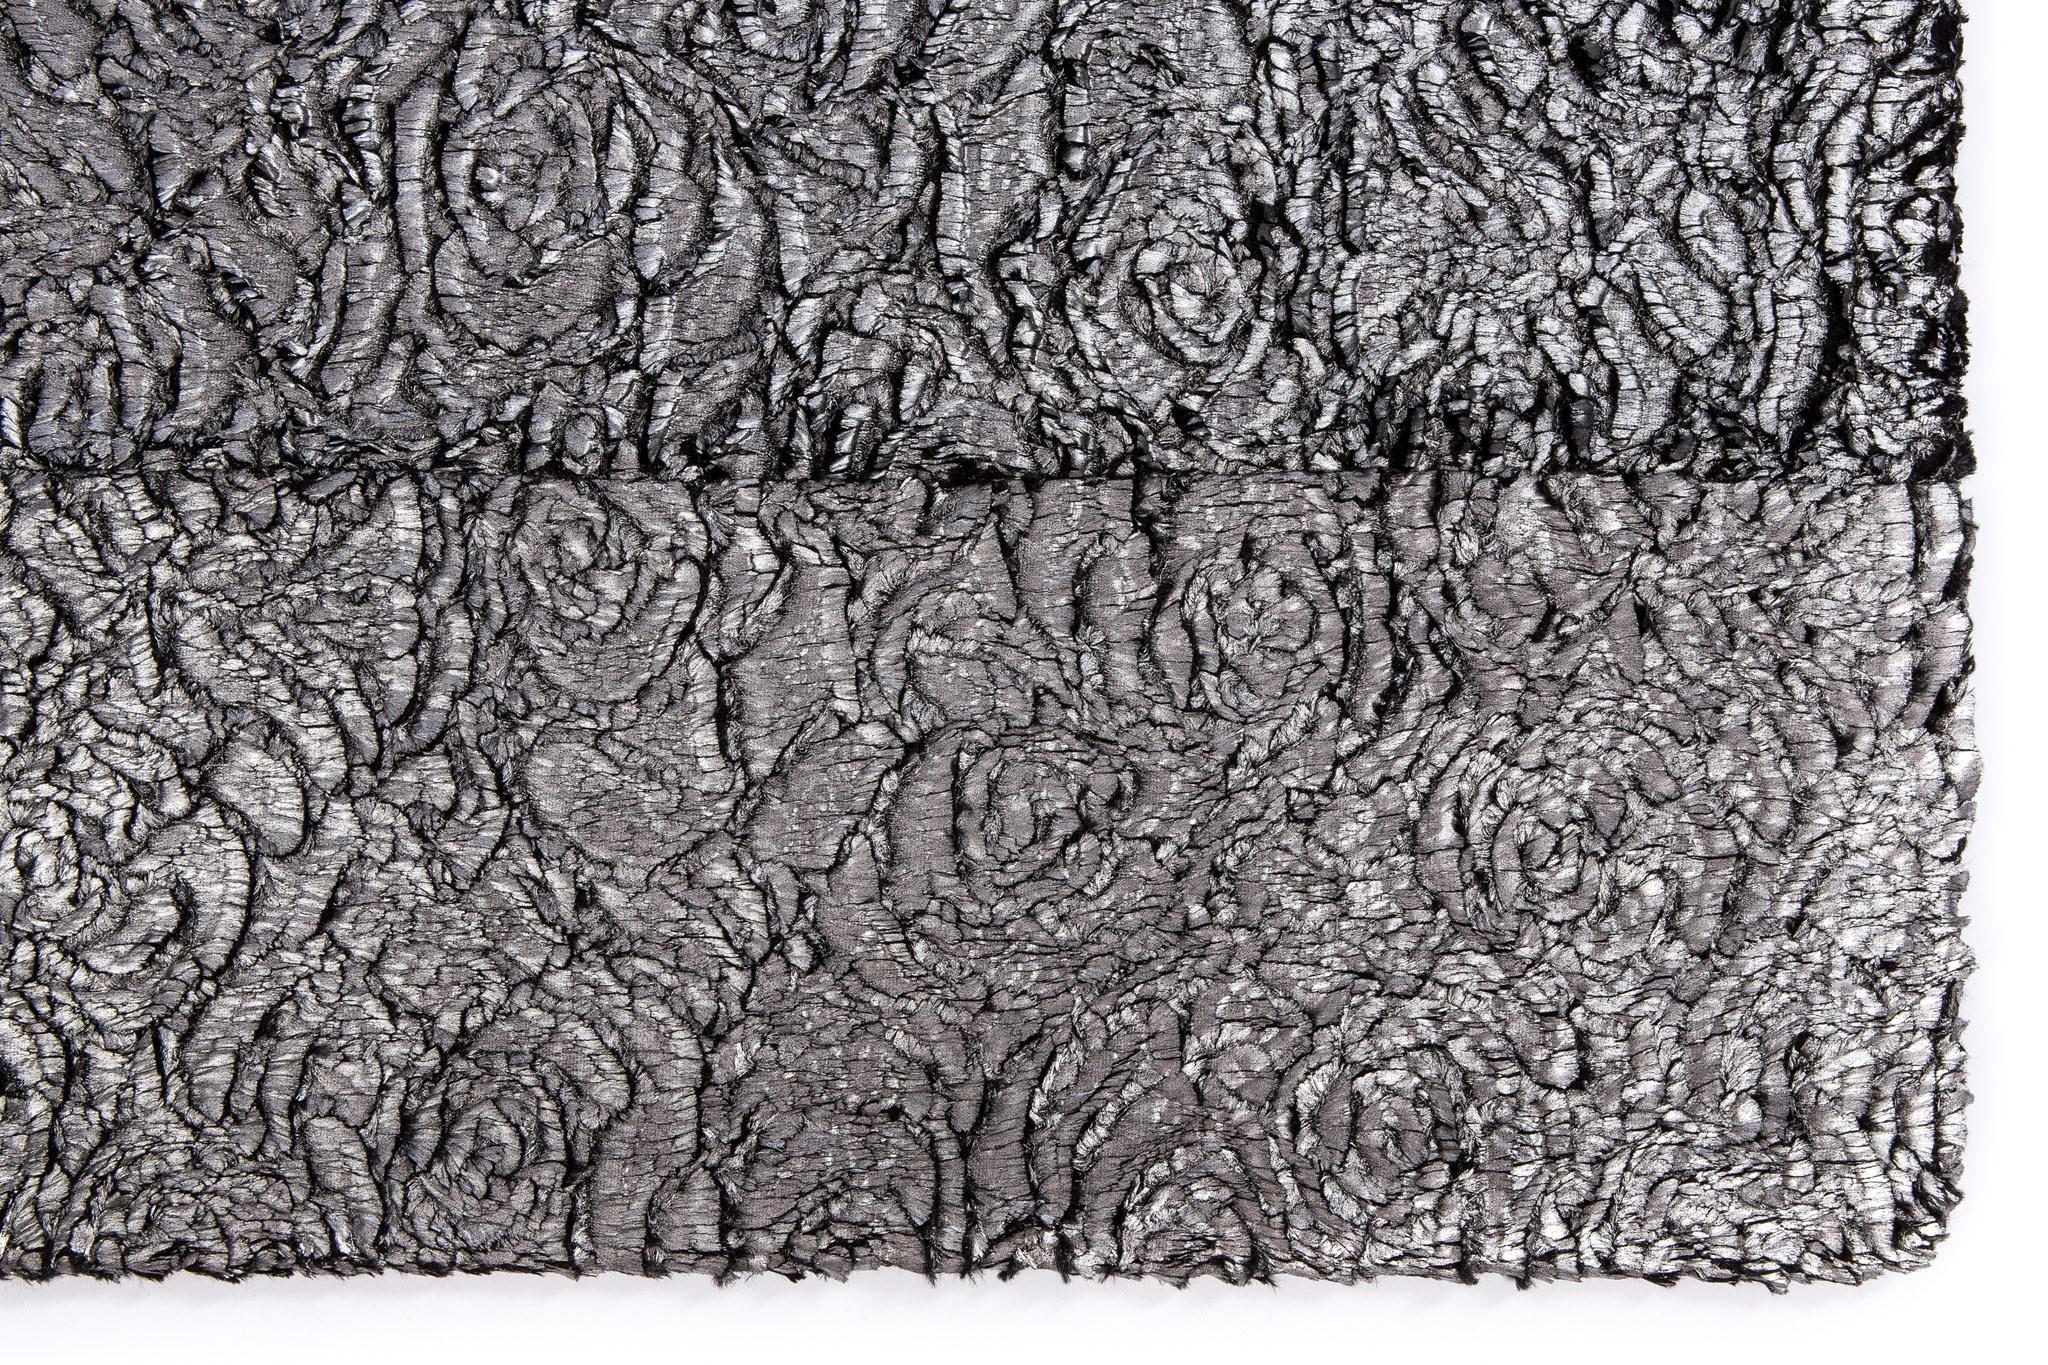 Velda Rose Rug: 6'x9' Silver